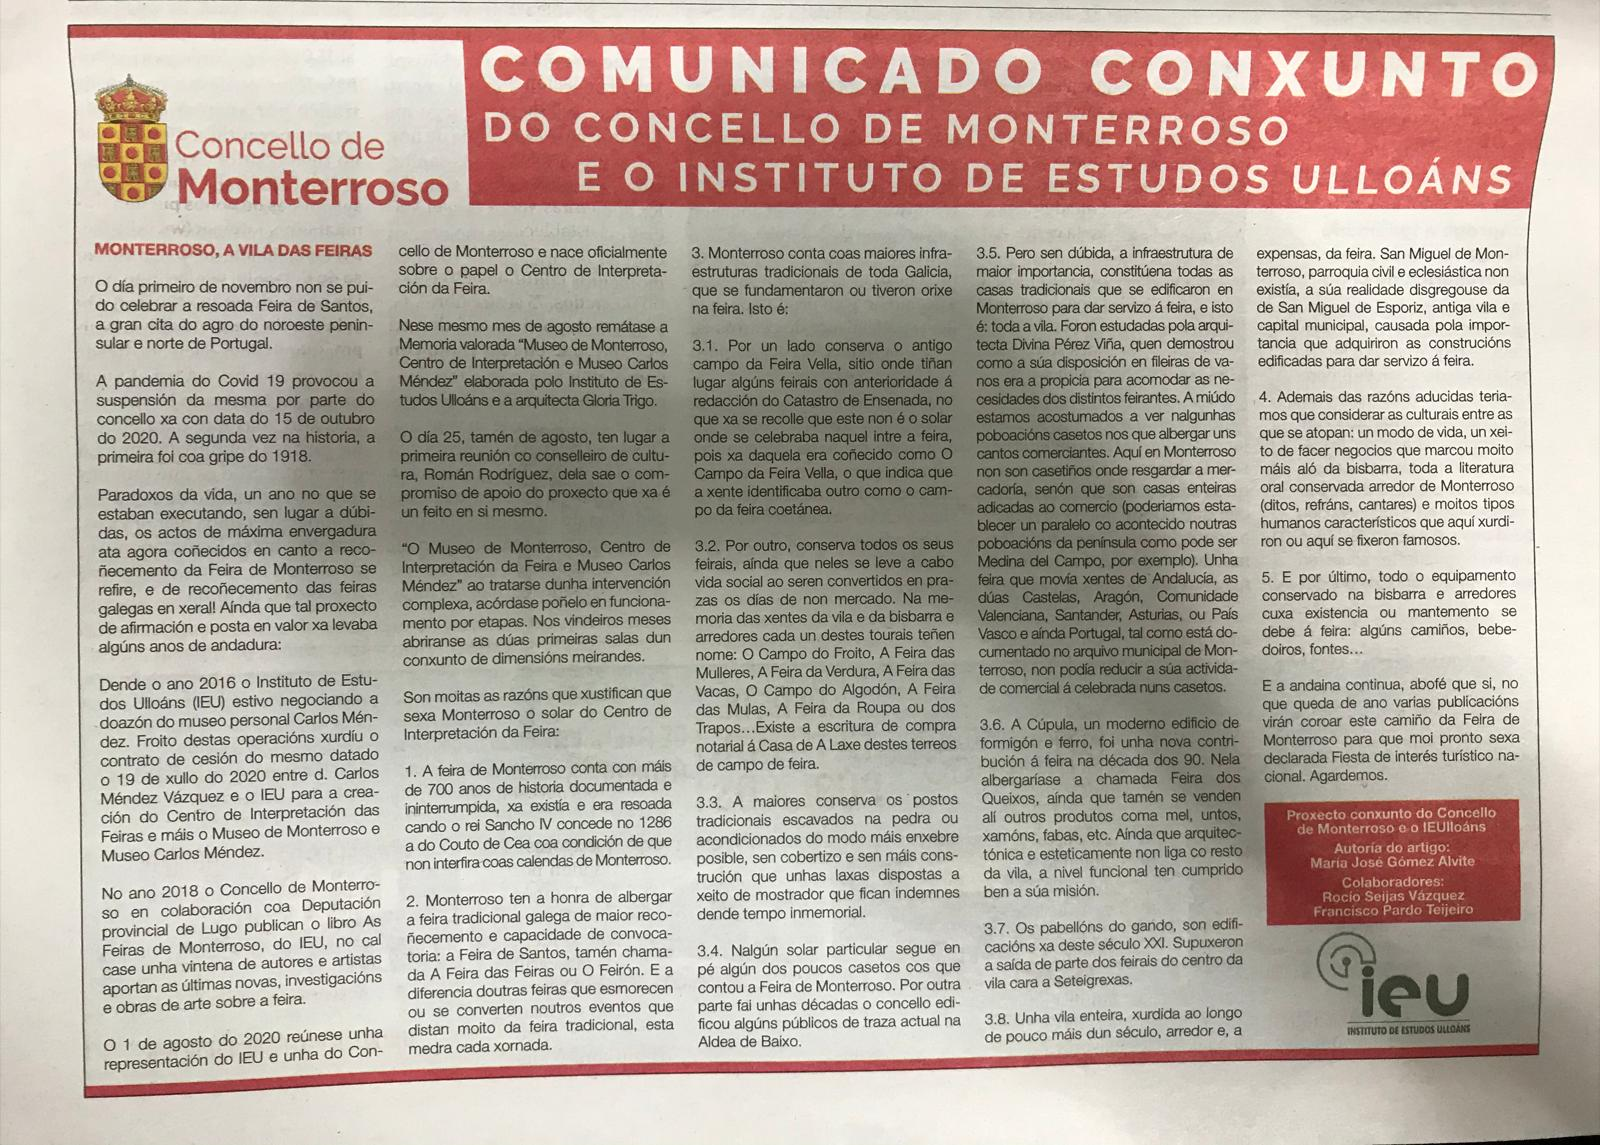 Comunicado Concello de Monterroso e Instituto de Estudos Ulloáns, María José Gómez Alvite, La Voz de Galicia 22-11-2021